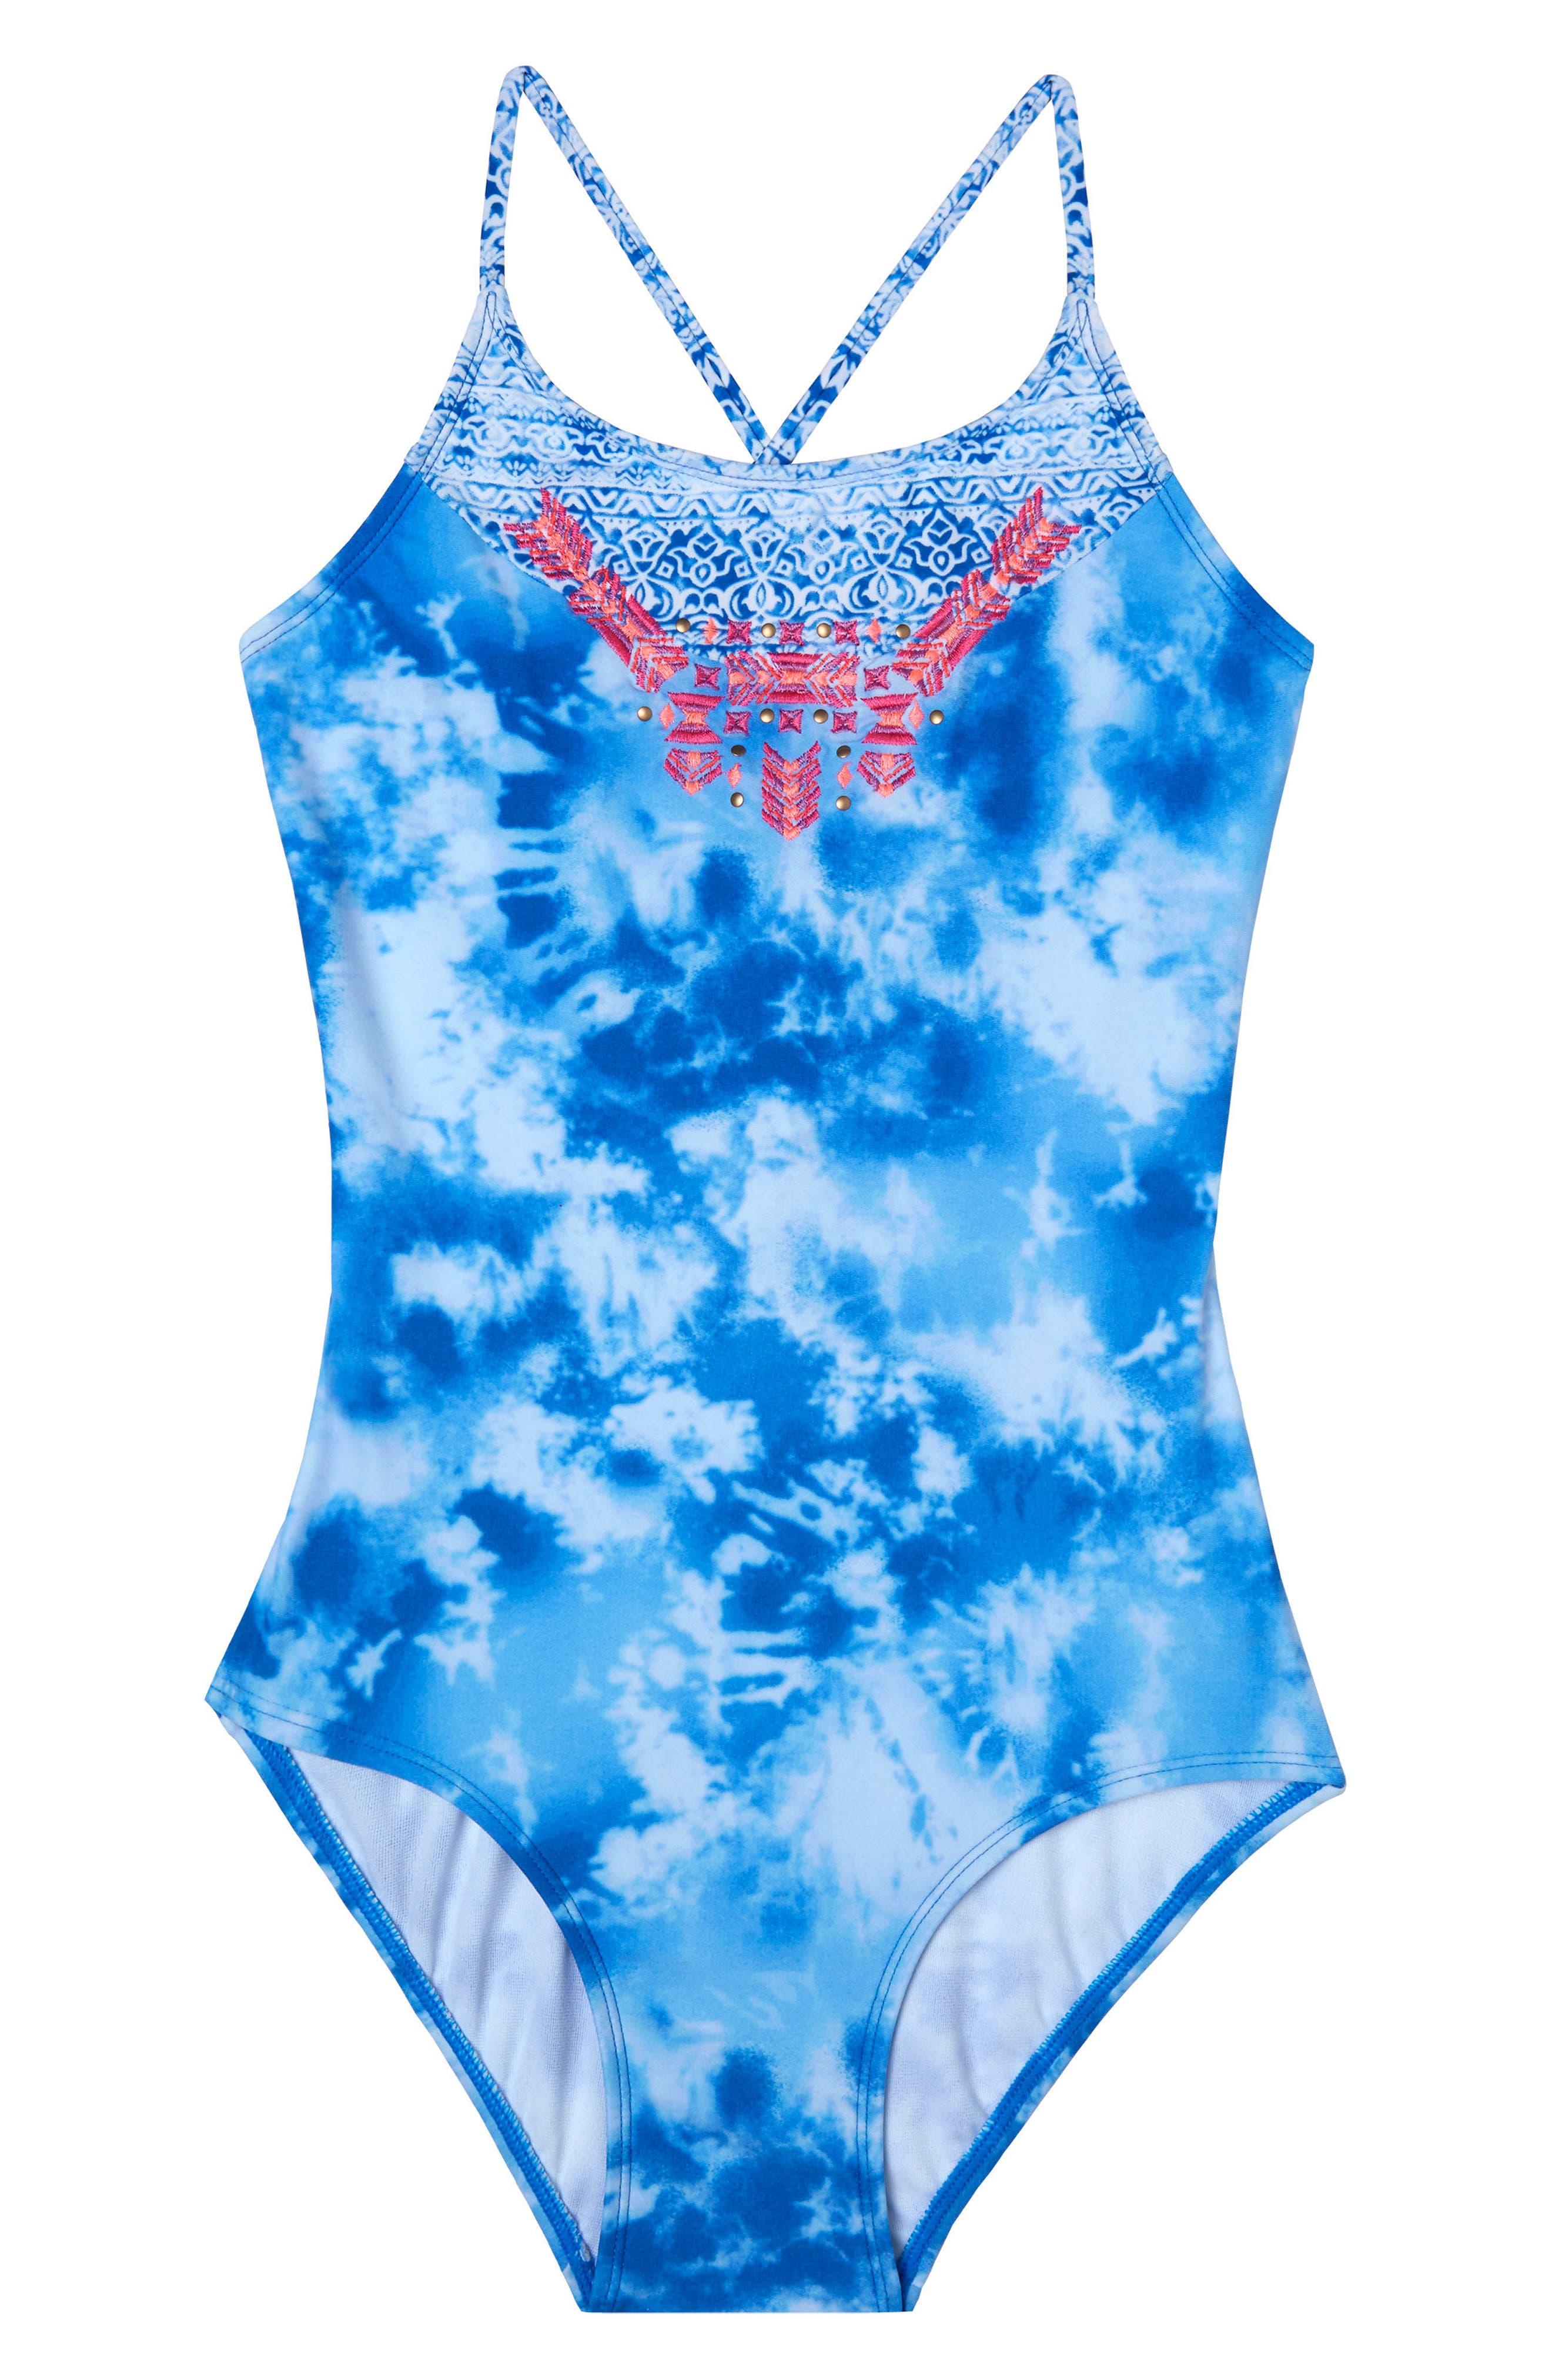 Jeans Addiction One-Piece Swimsuit,                         Main,                         color, Blue